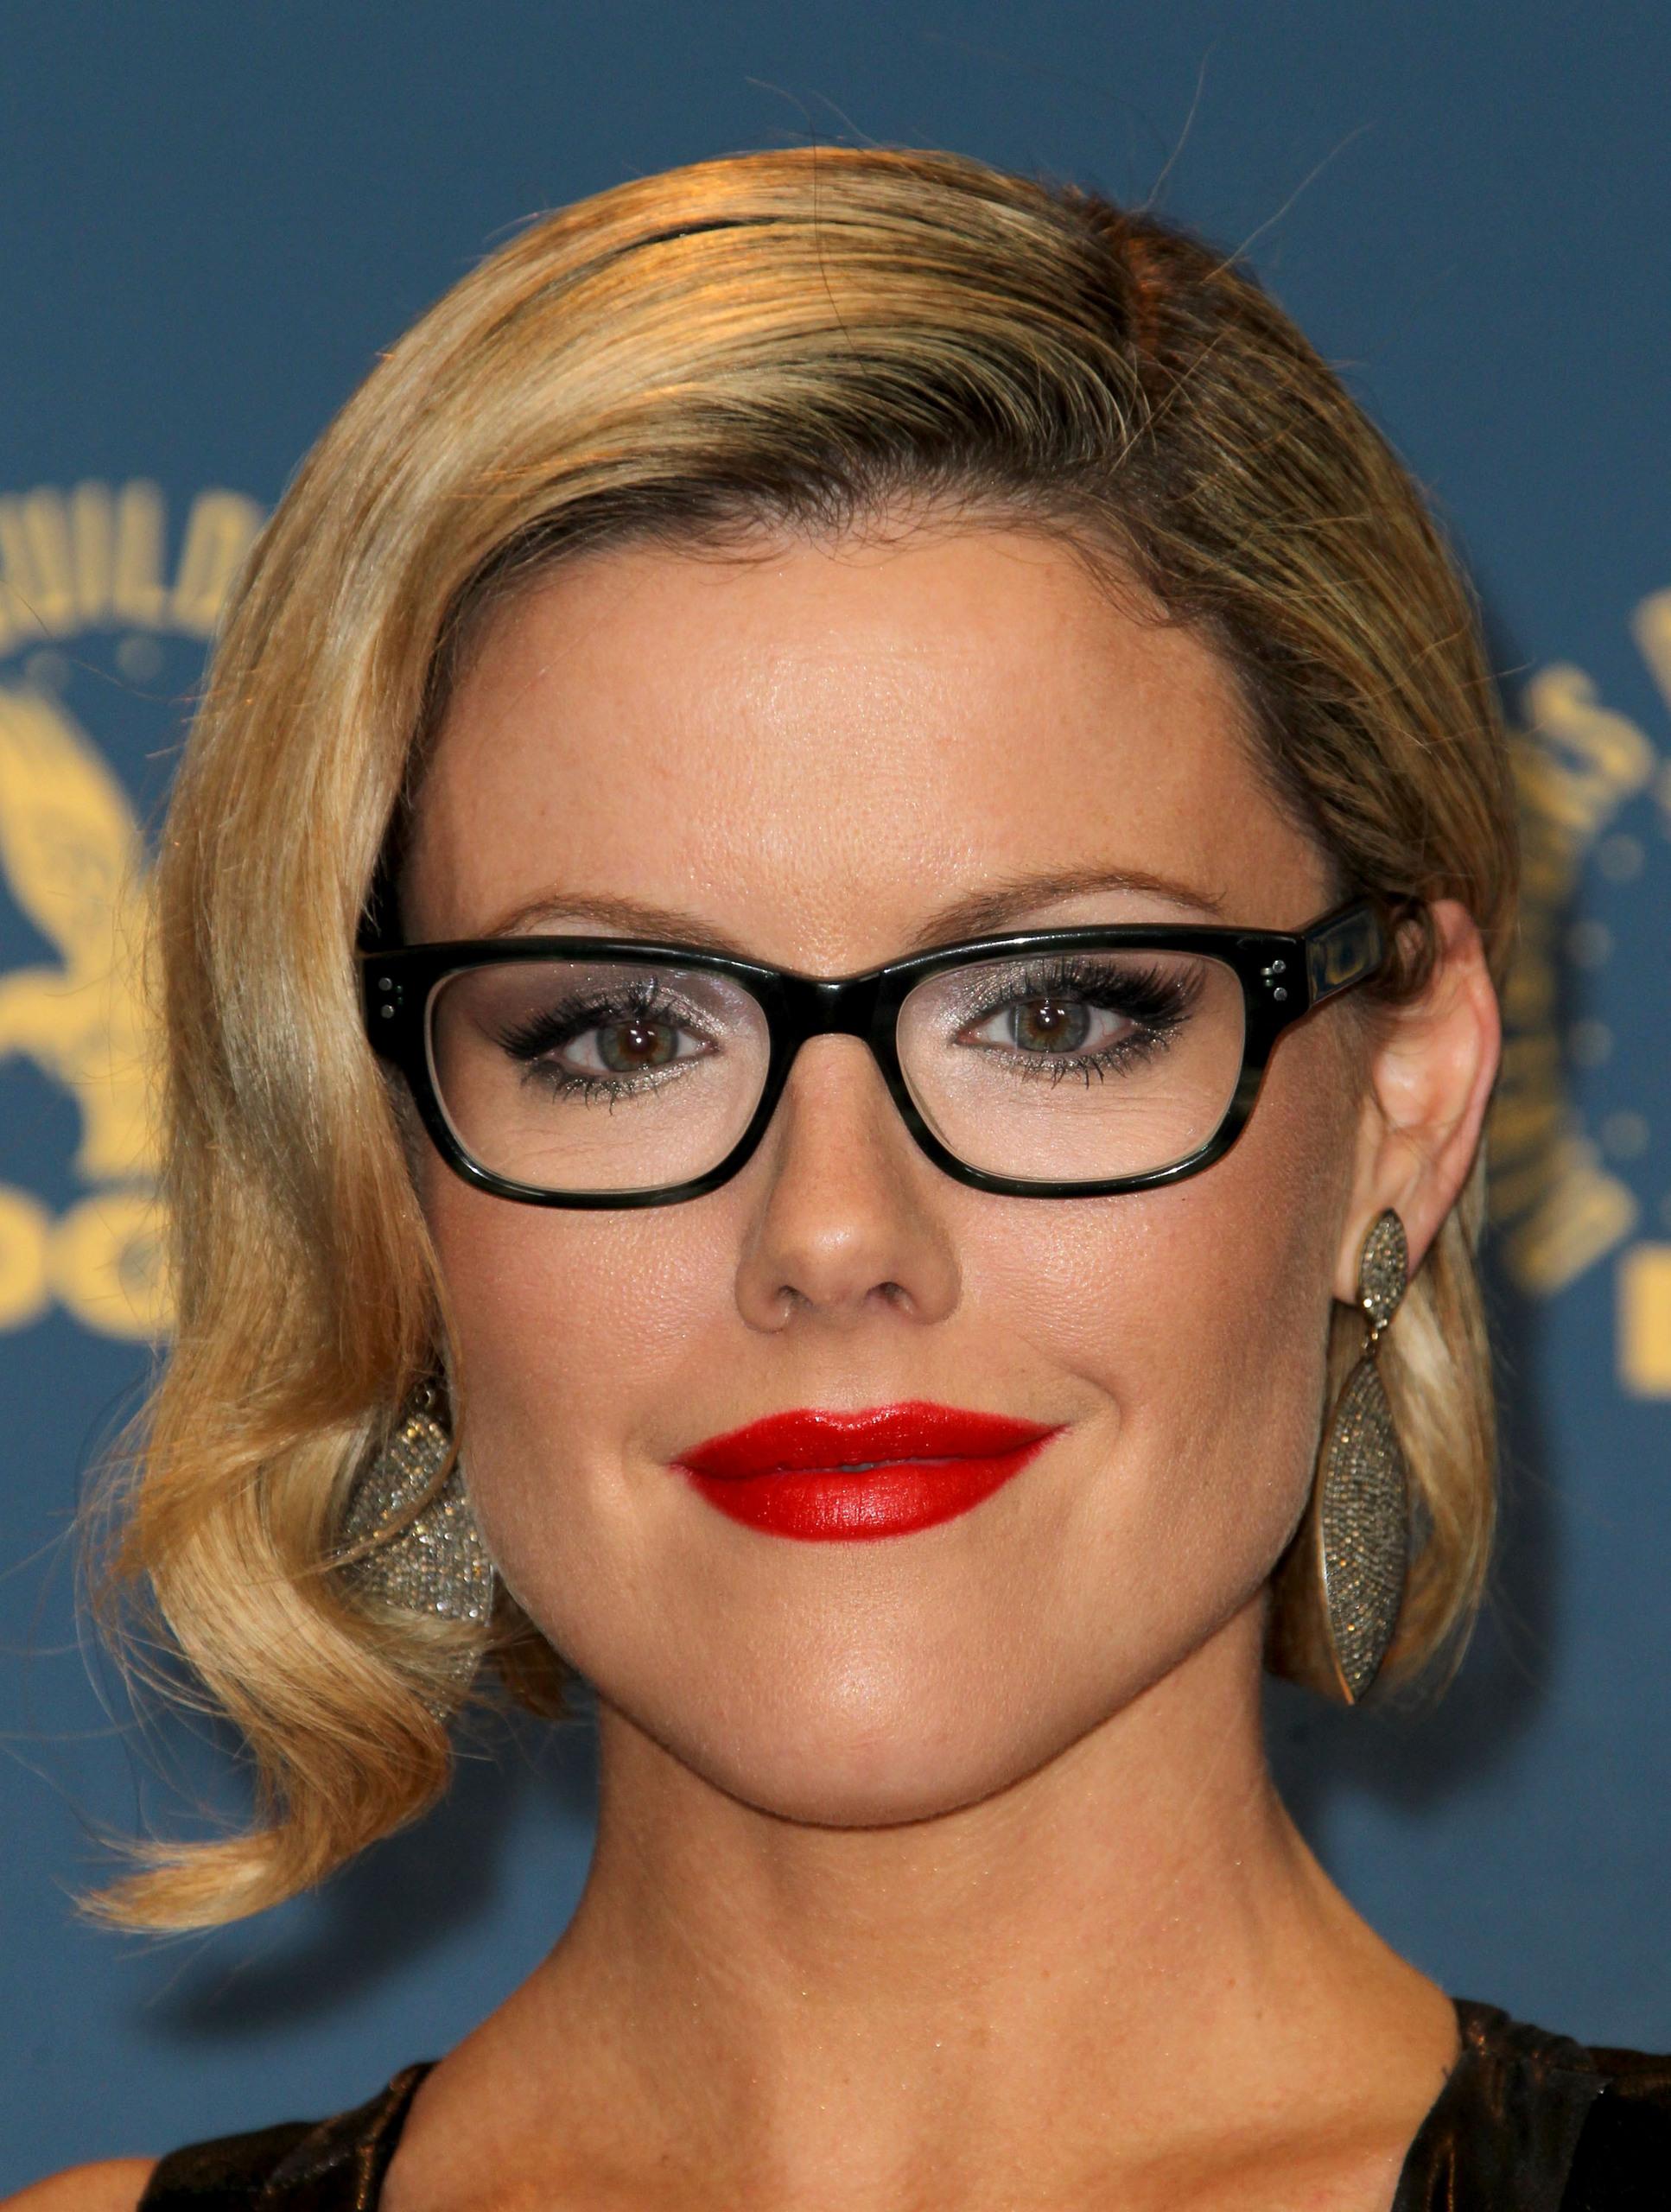 Eyeglass Frame For Chubby Face : Kathleen Robertson - Kathleen Robertson Photo (30828498 ...